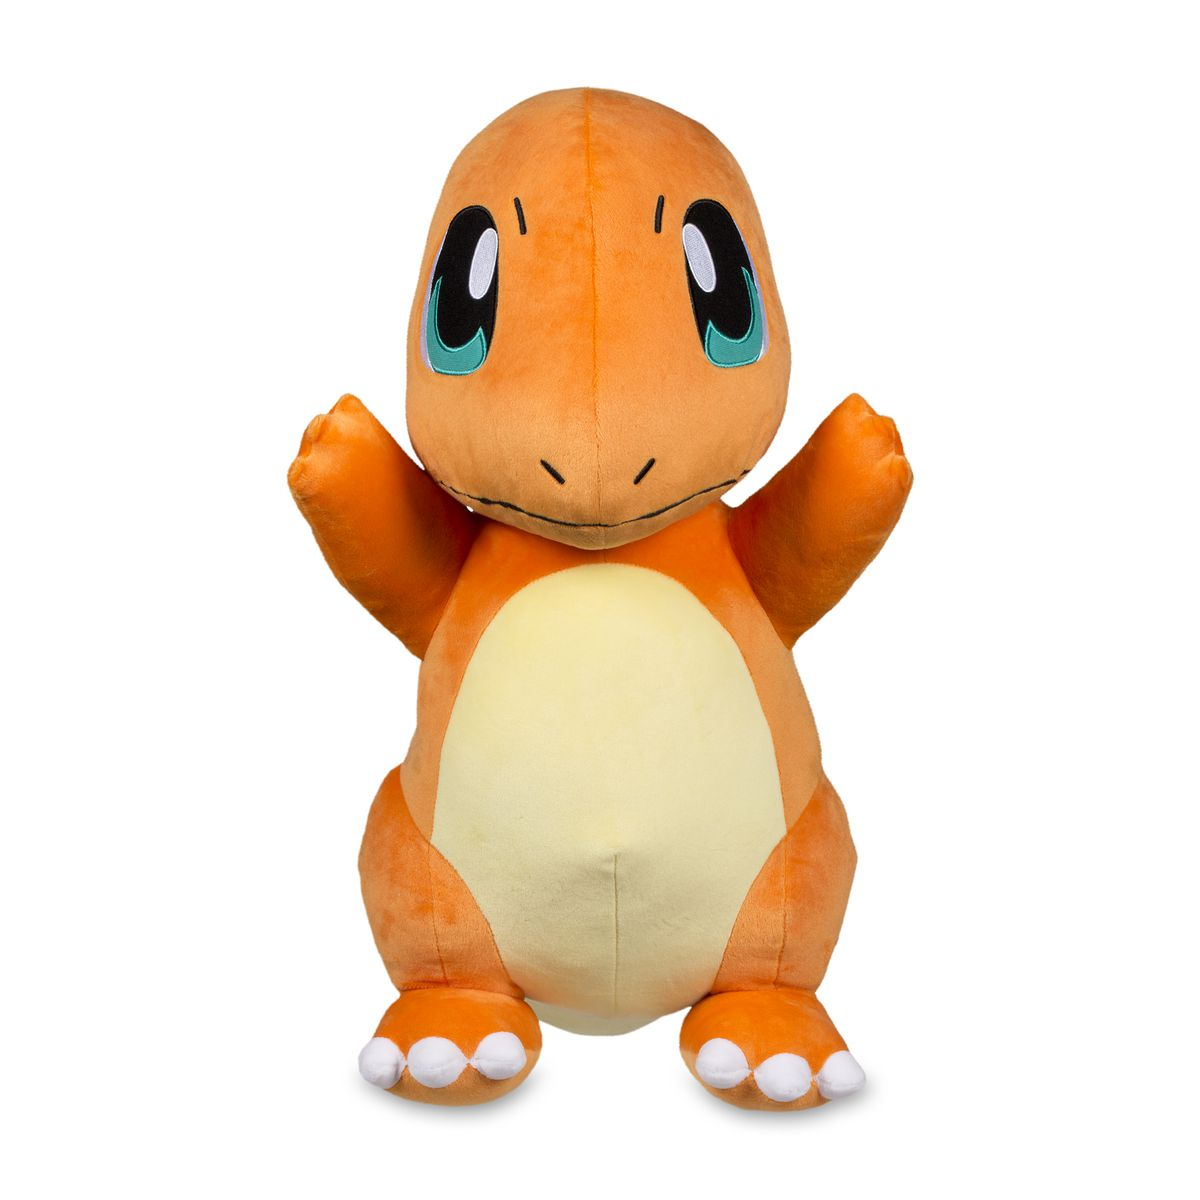 Jumbo Charmander Pokémon plush